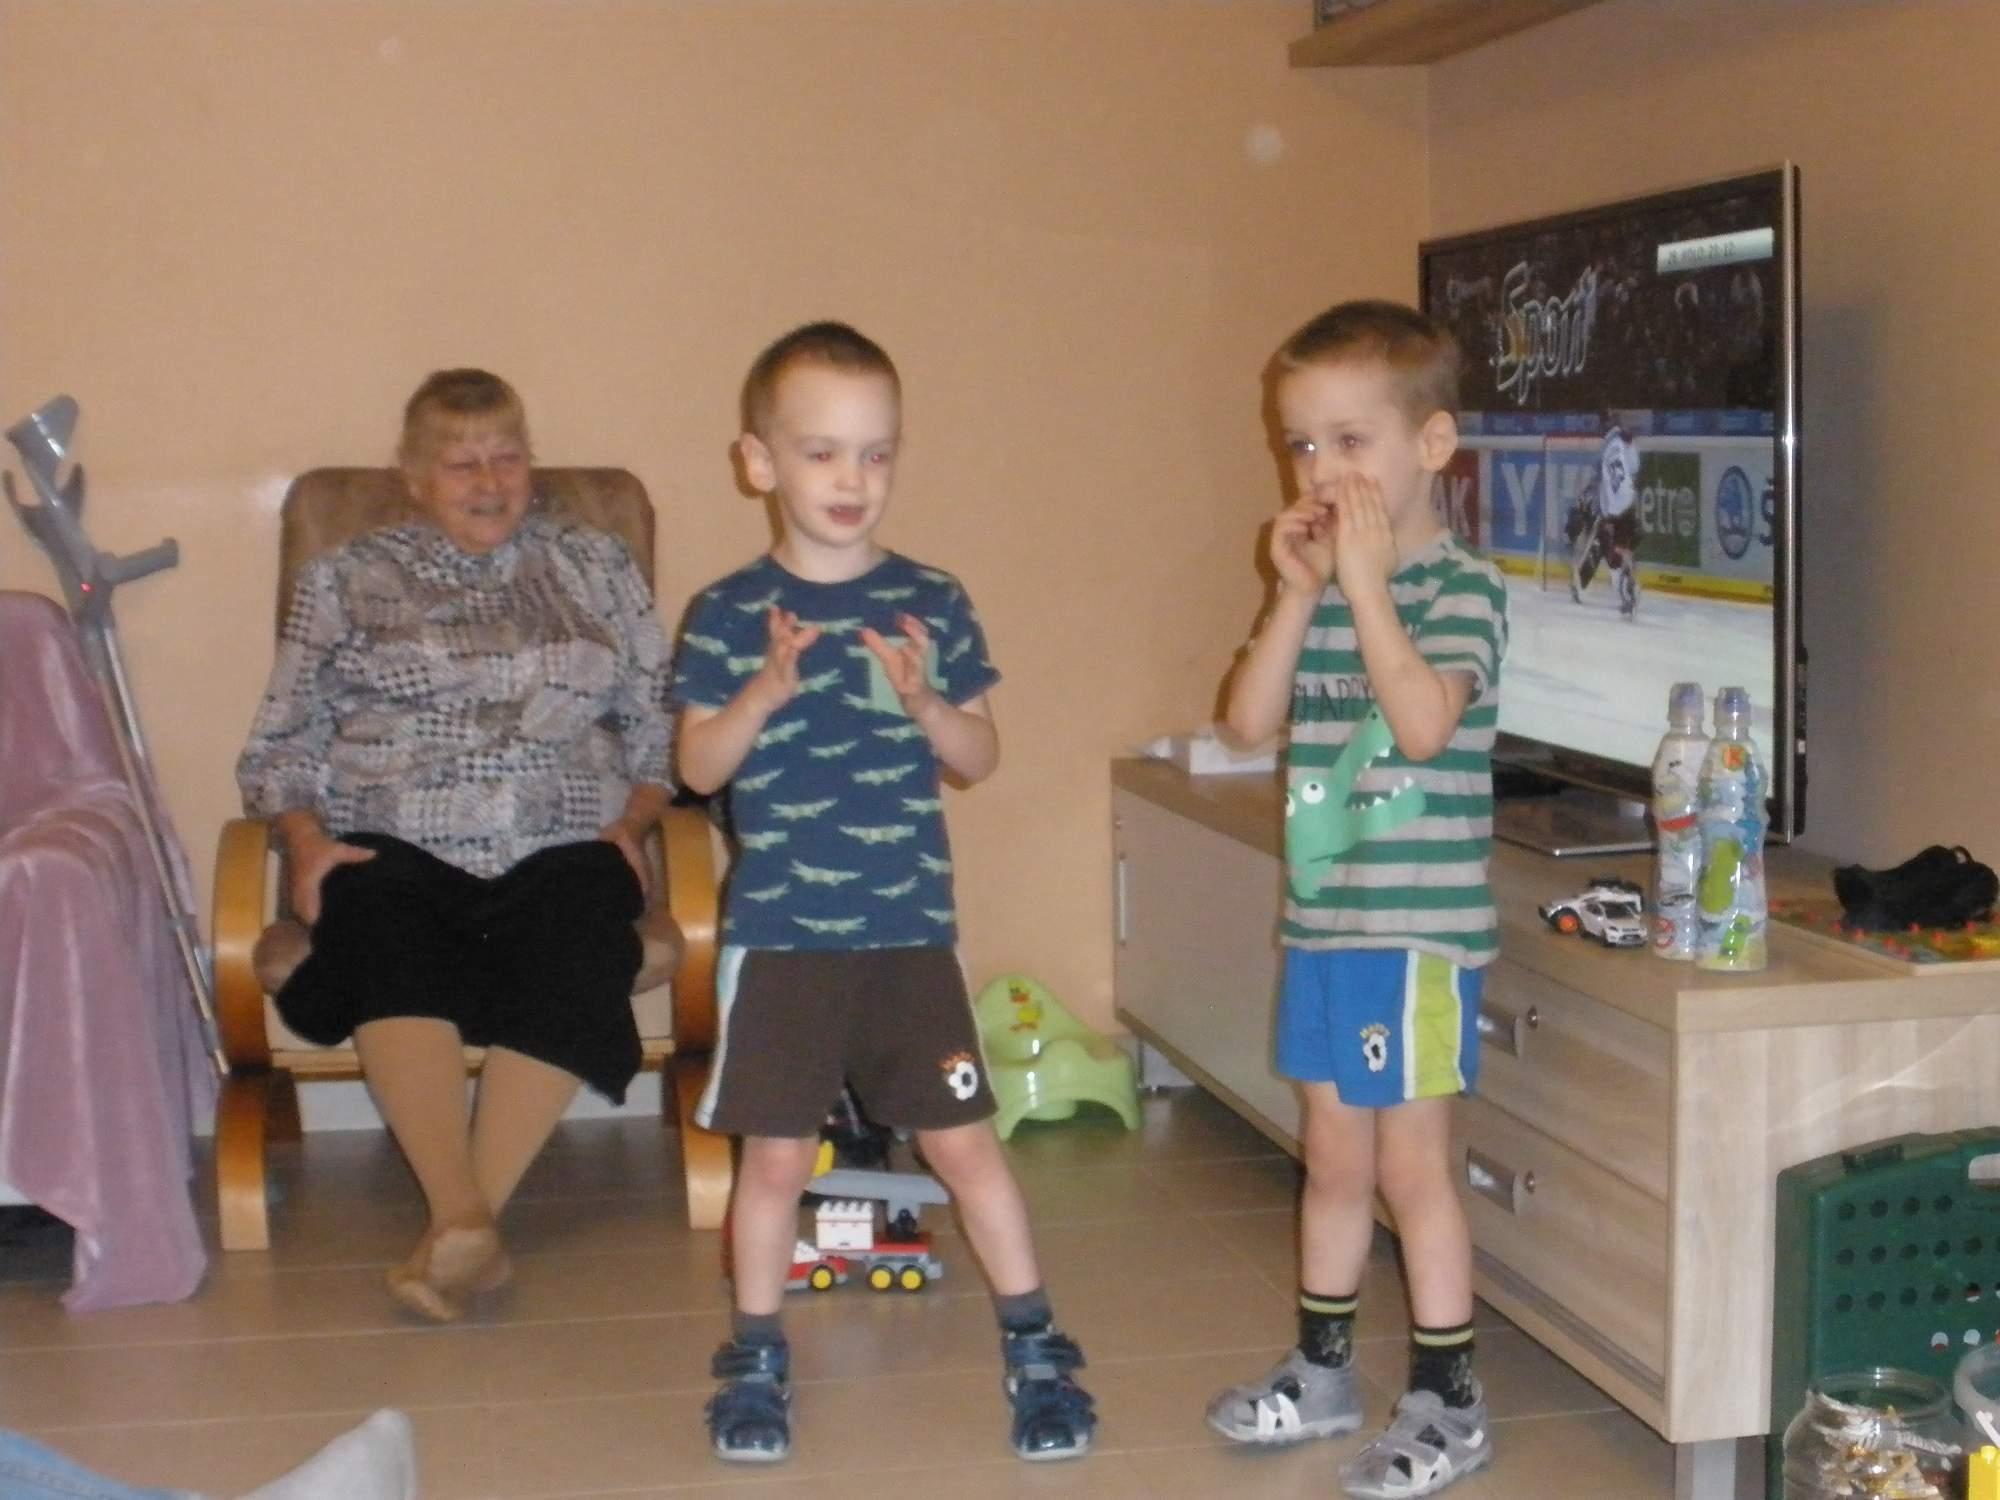 .rajce.idnes.cz children   holky rajce.idnes. k 5.holky 10.8. 2012 – pultarky – album na Rajčeti